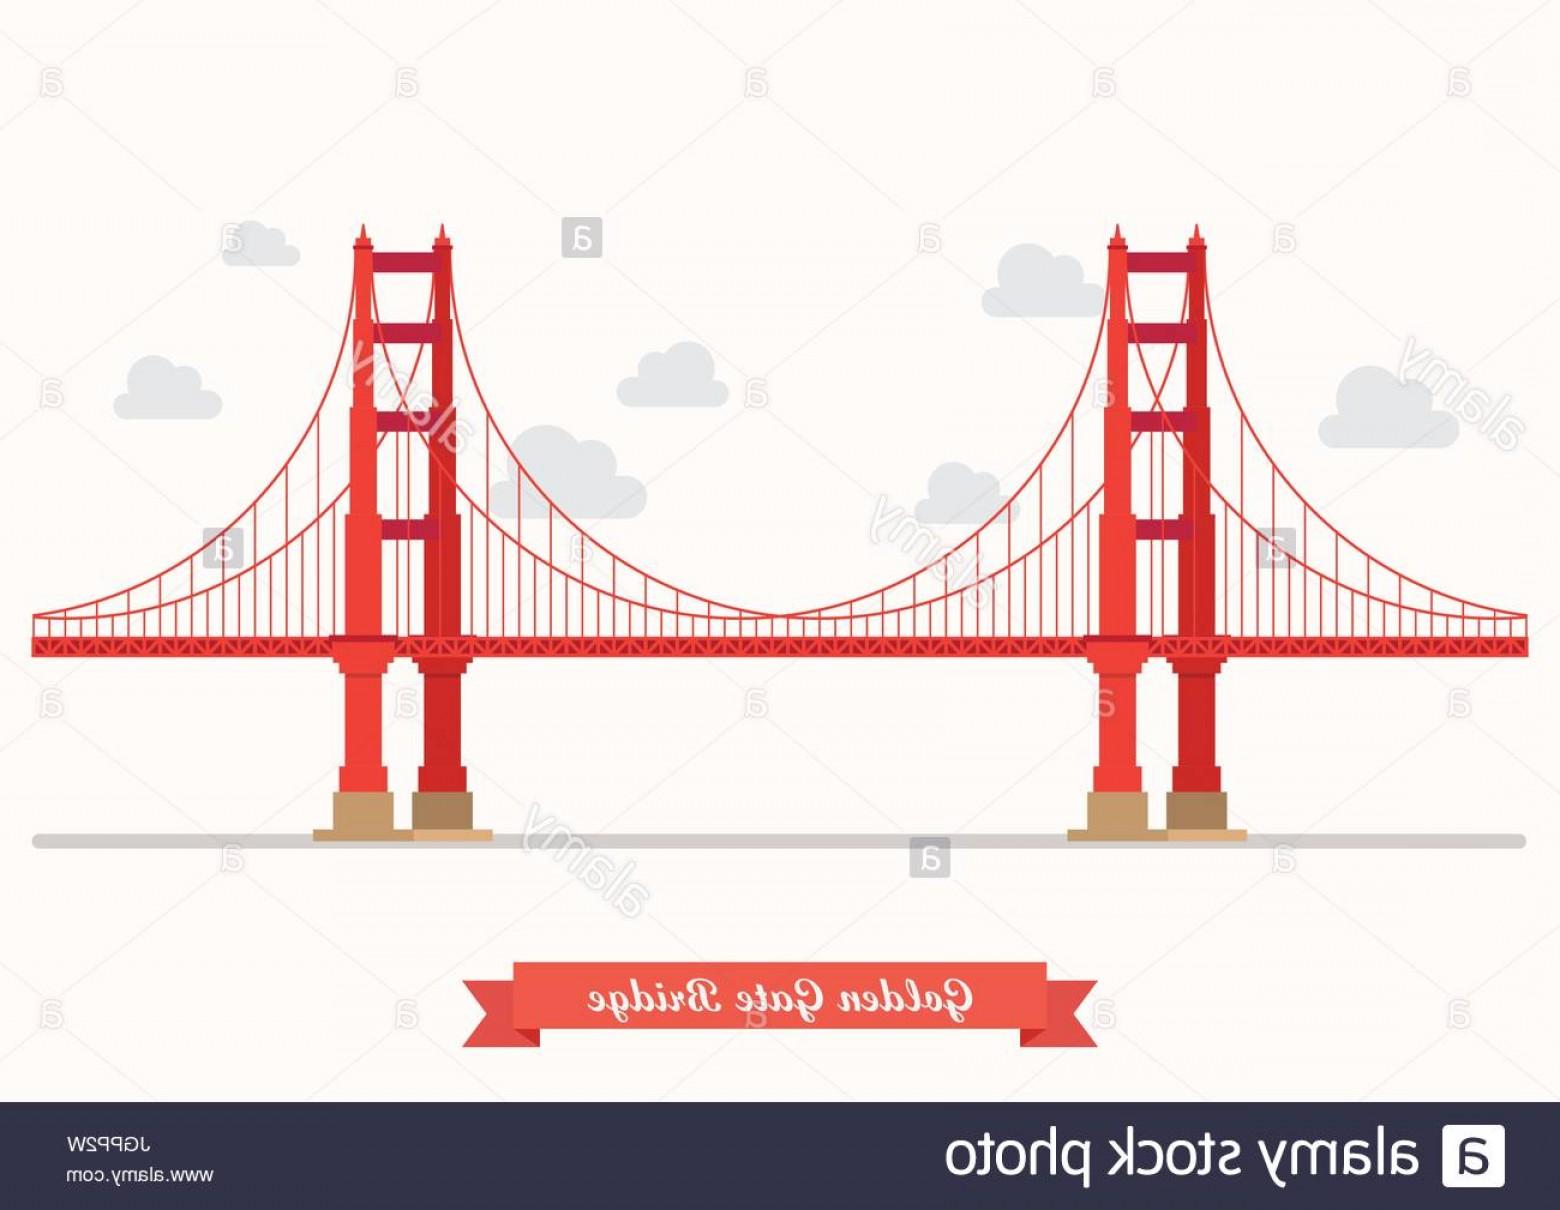 1560x1210 Stock Photo Golden Gate Bridge Illustration Flat Style Design